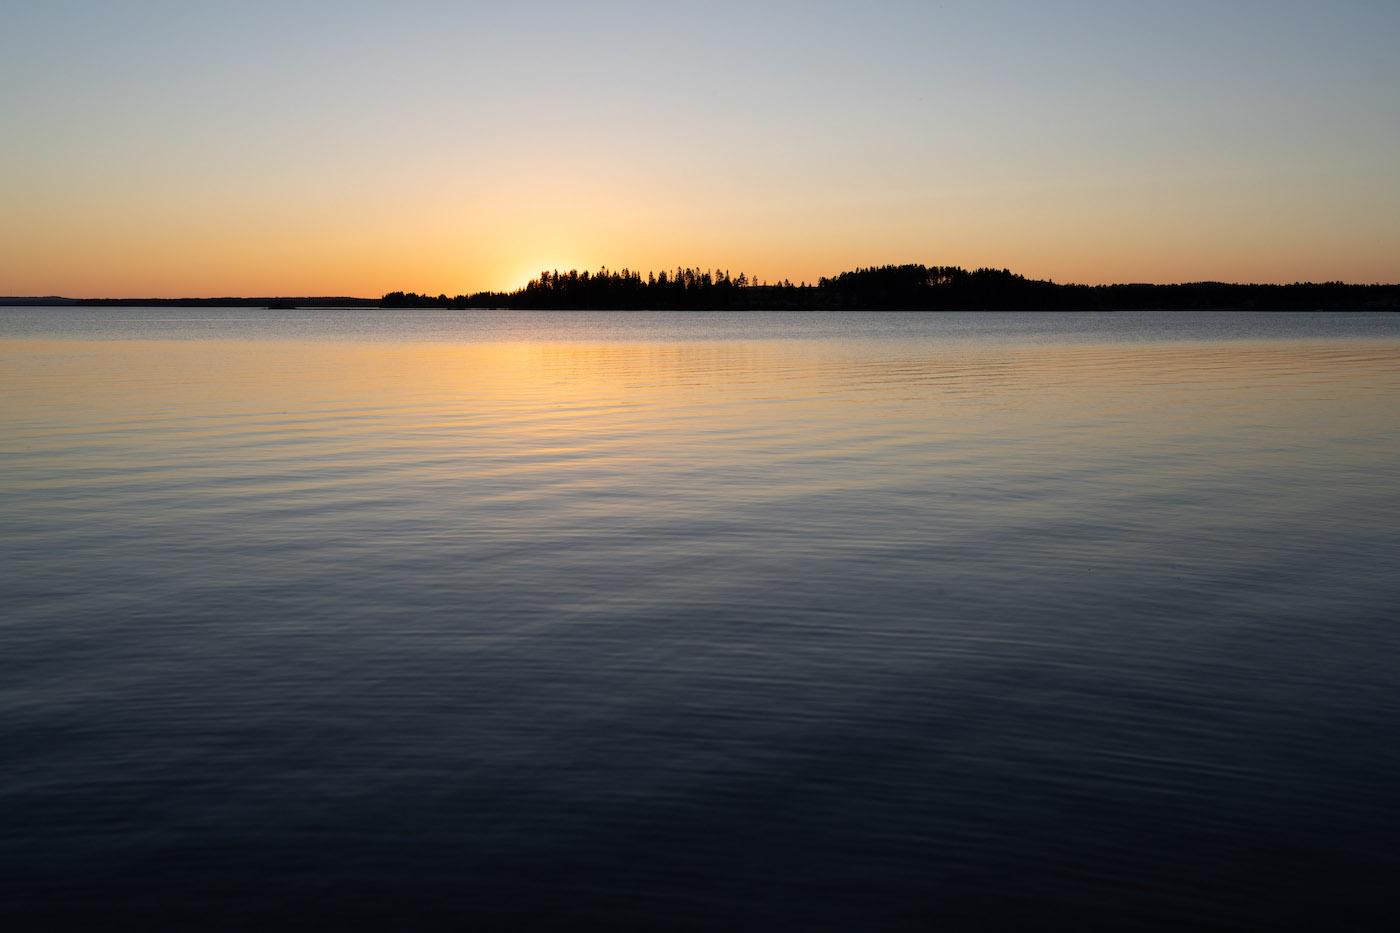 finse meren in finland